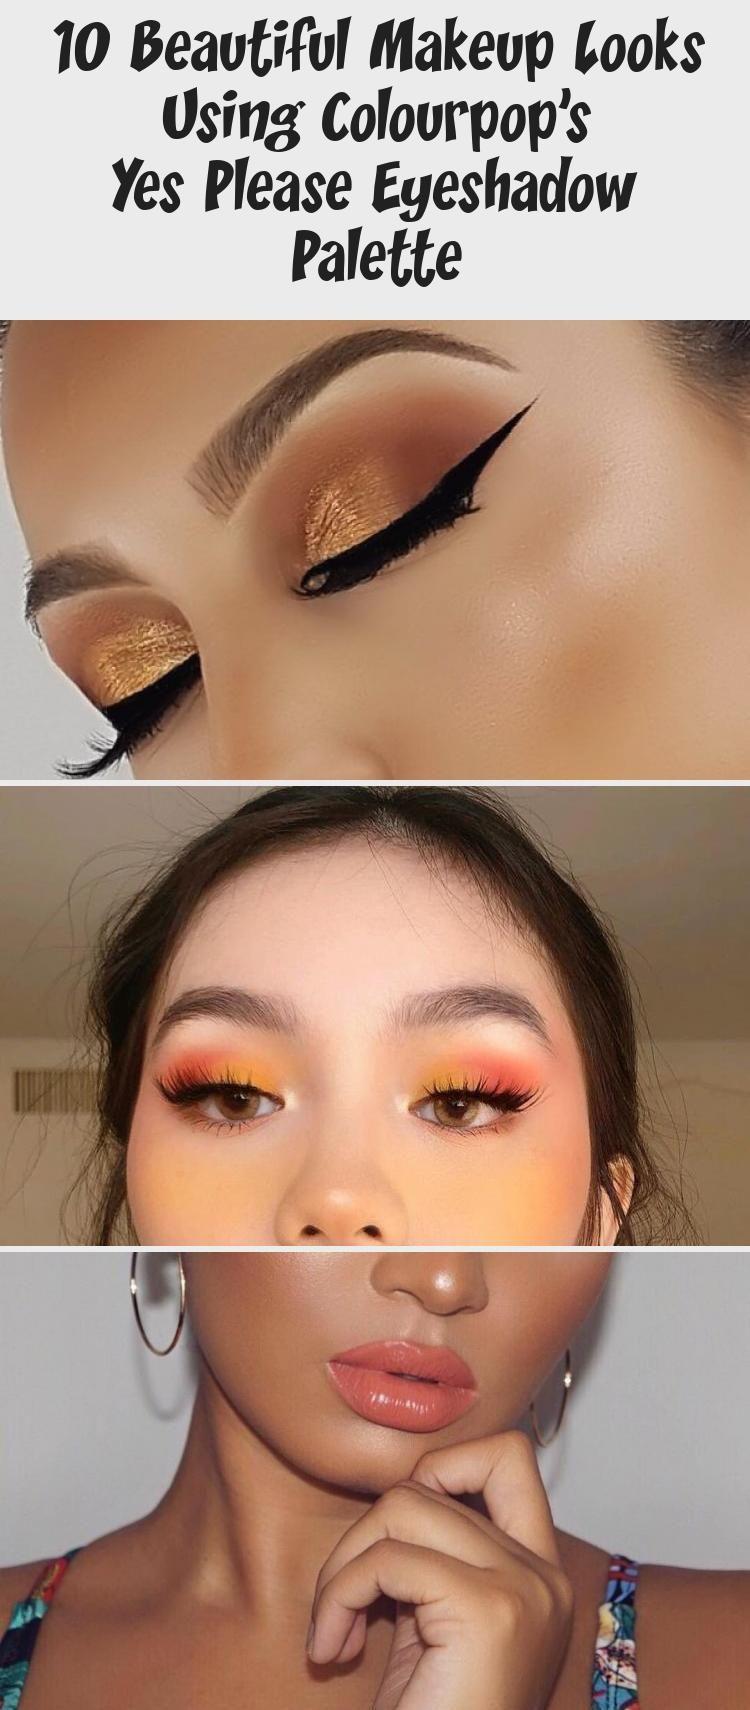 10 Beautiful Makeup Looks Using Colourpop S Yes Please Eyeshadow